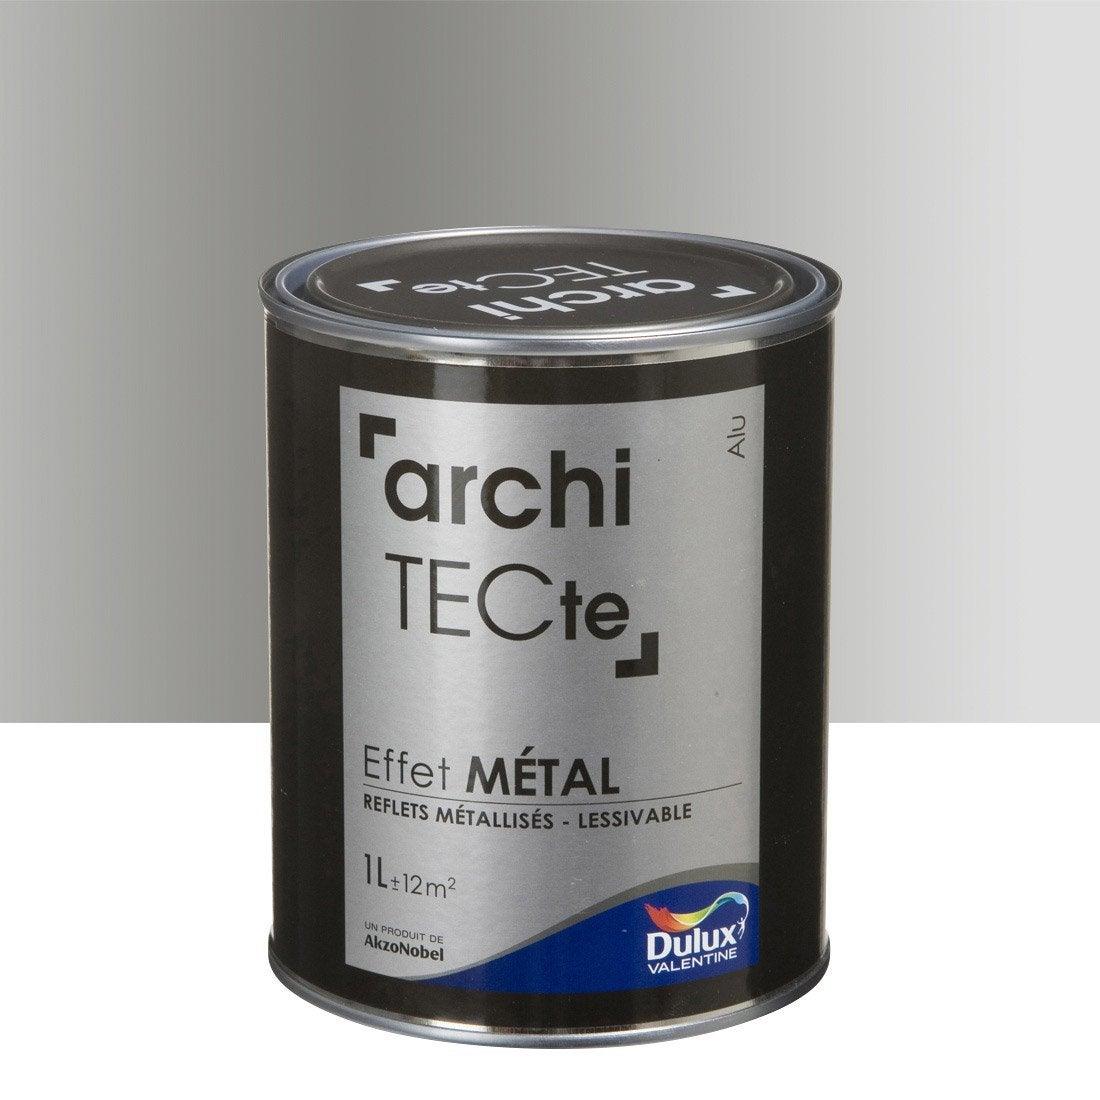 Peinture effet architecte effet m tal dulux valentine gris aluminium 1 l - Peinture a effet metal ...